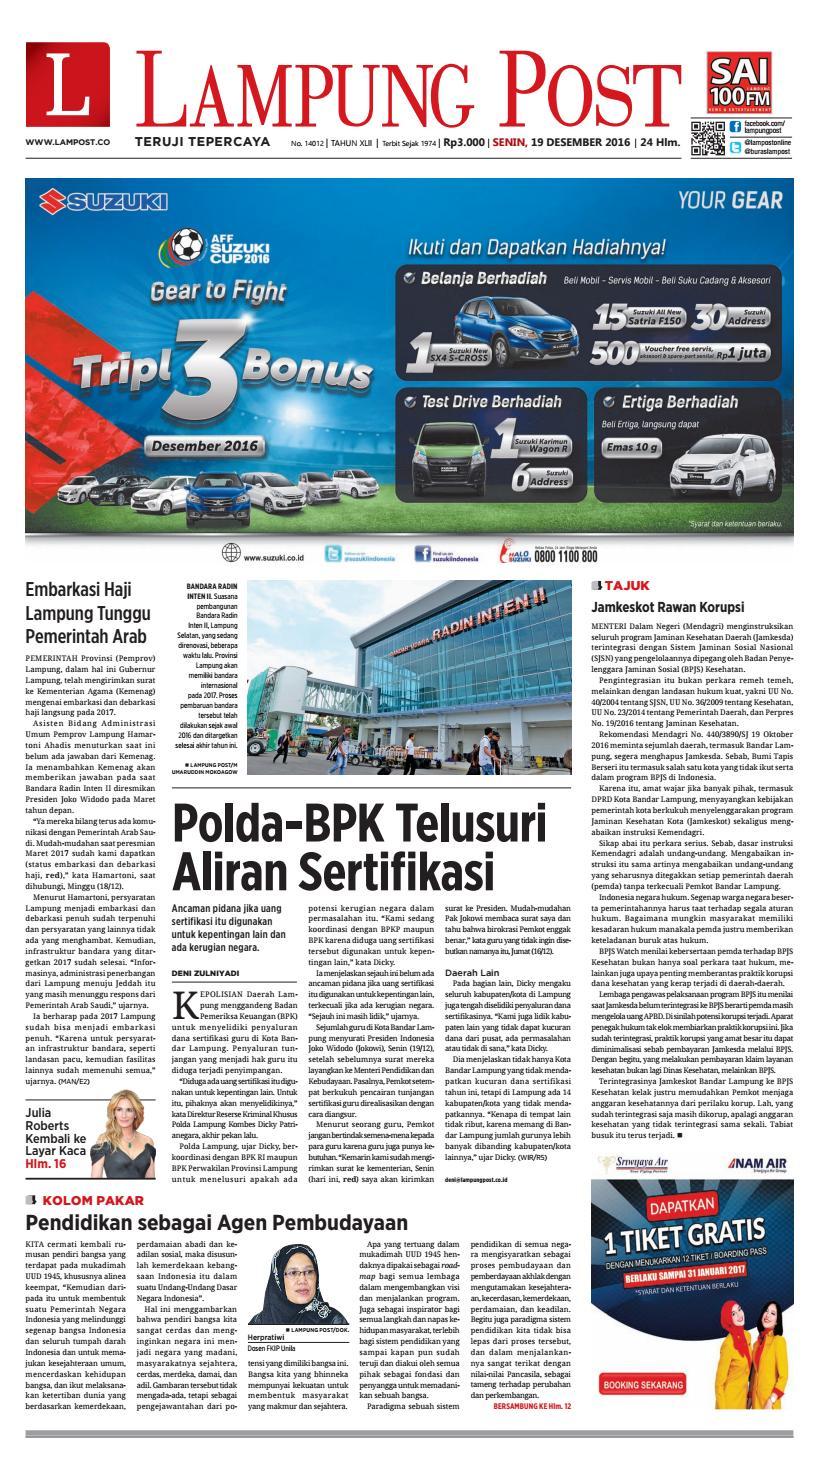 Lampung Post Senin 19 Desember 2016 By Lampung Post Issuu